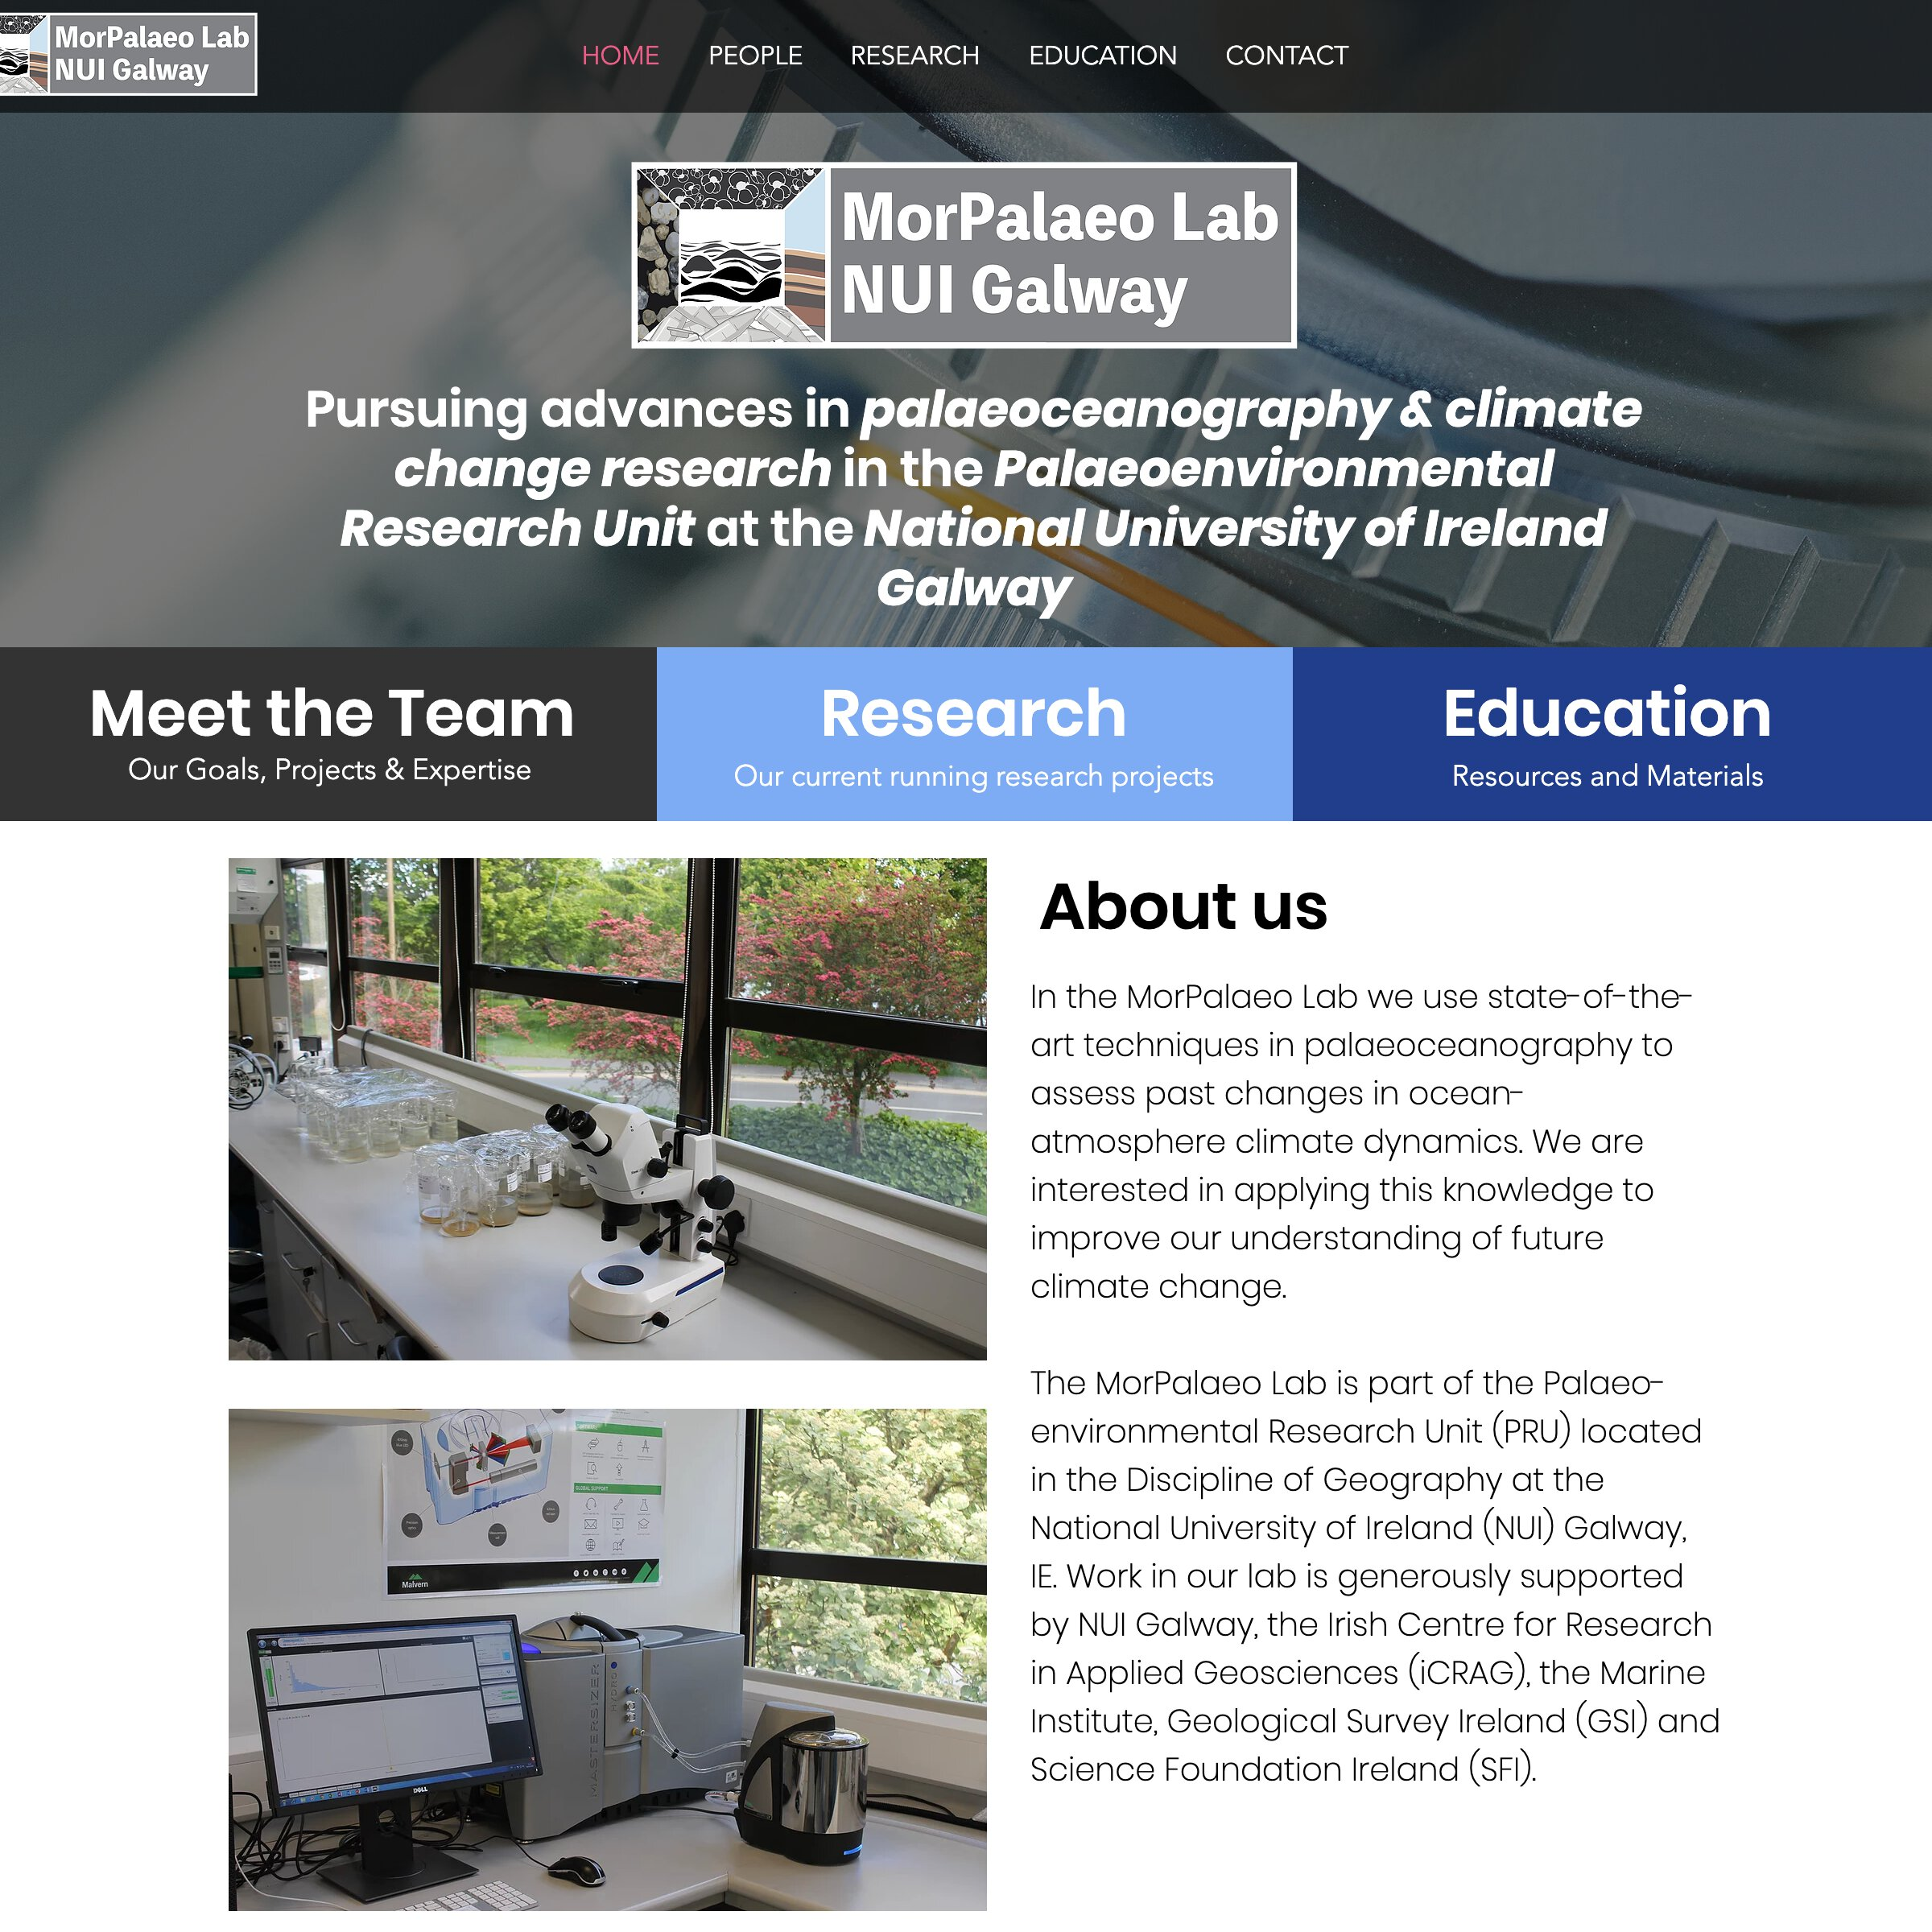 Morpalaeo lab